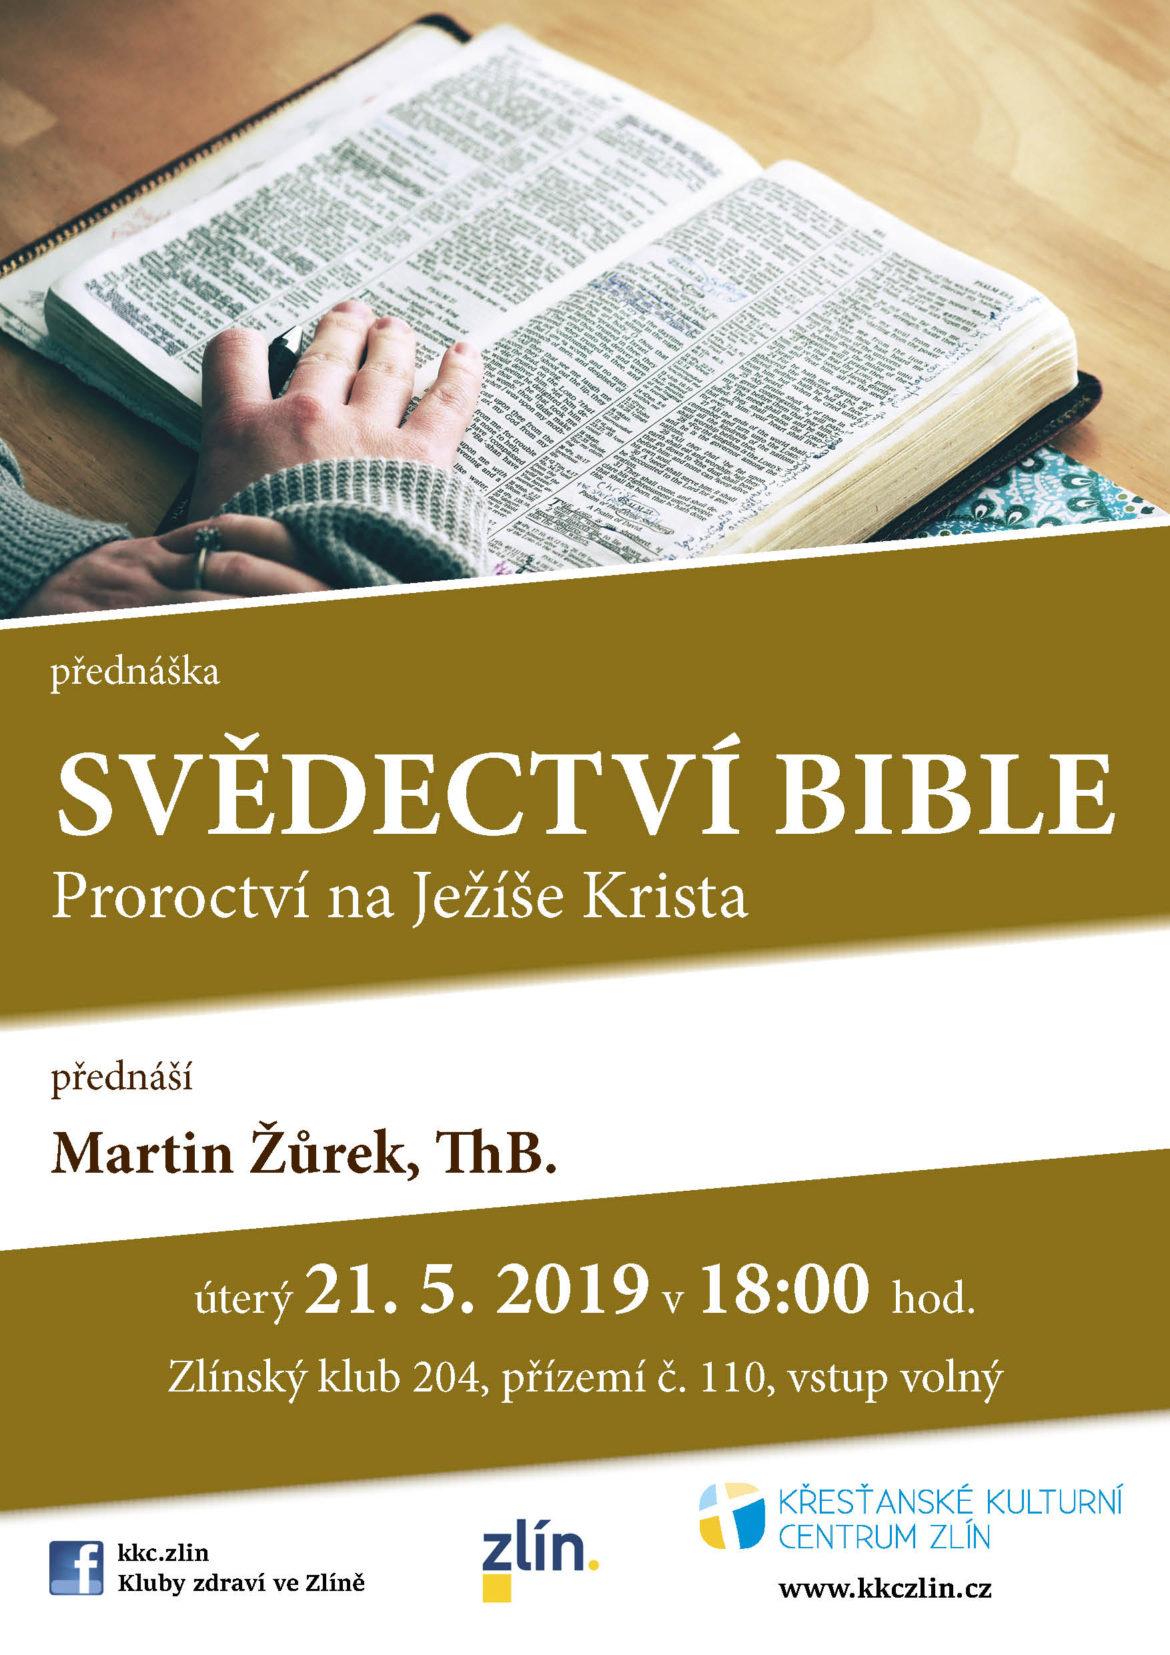 Svědectví Bible. Martin Žůrek, ThB.